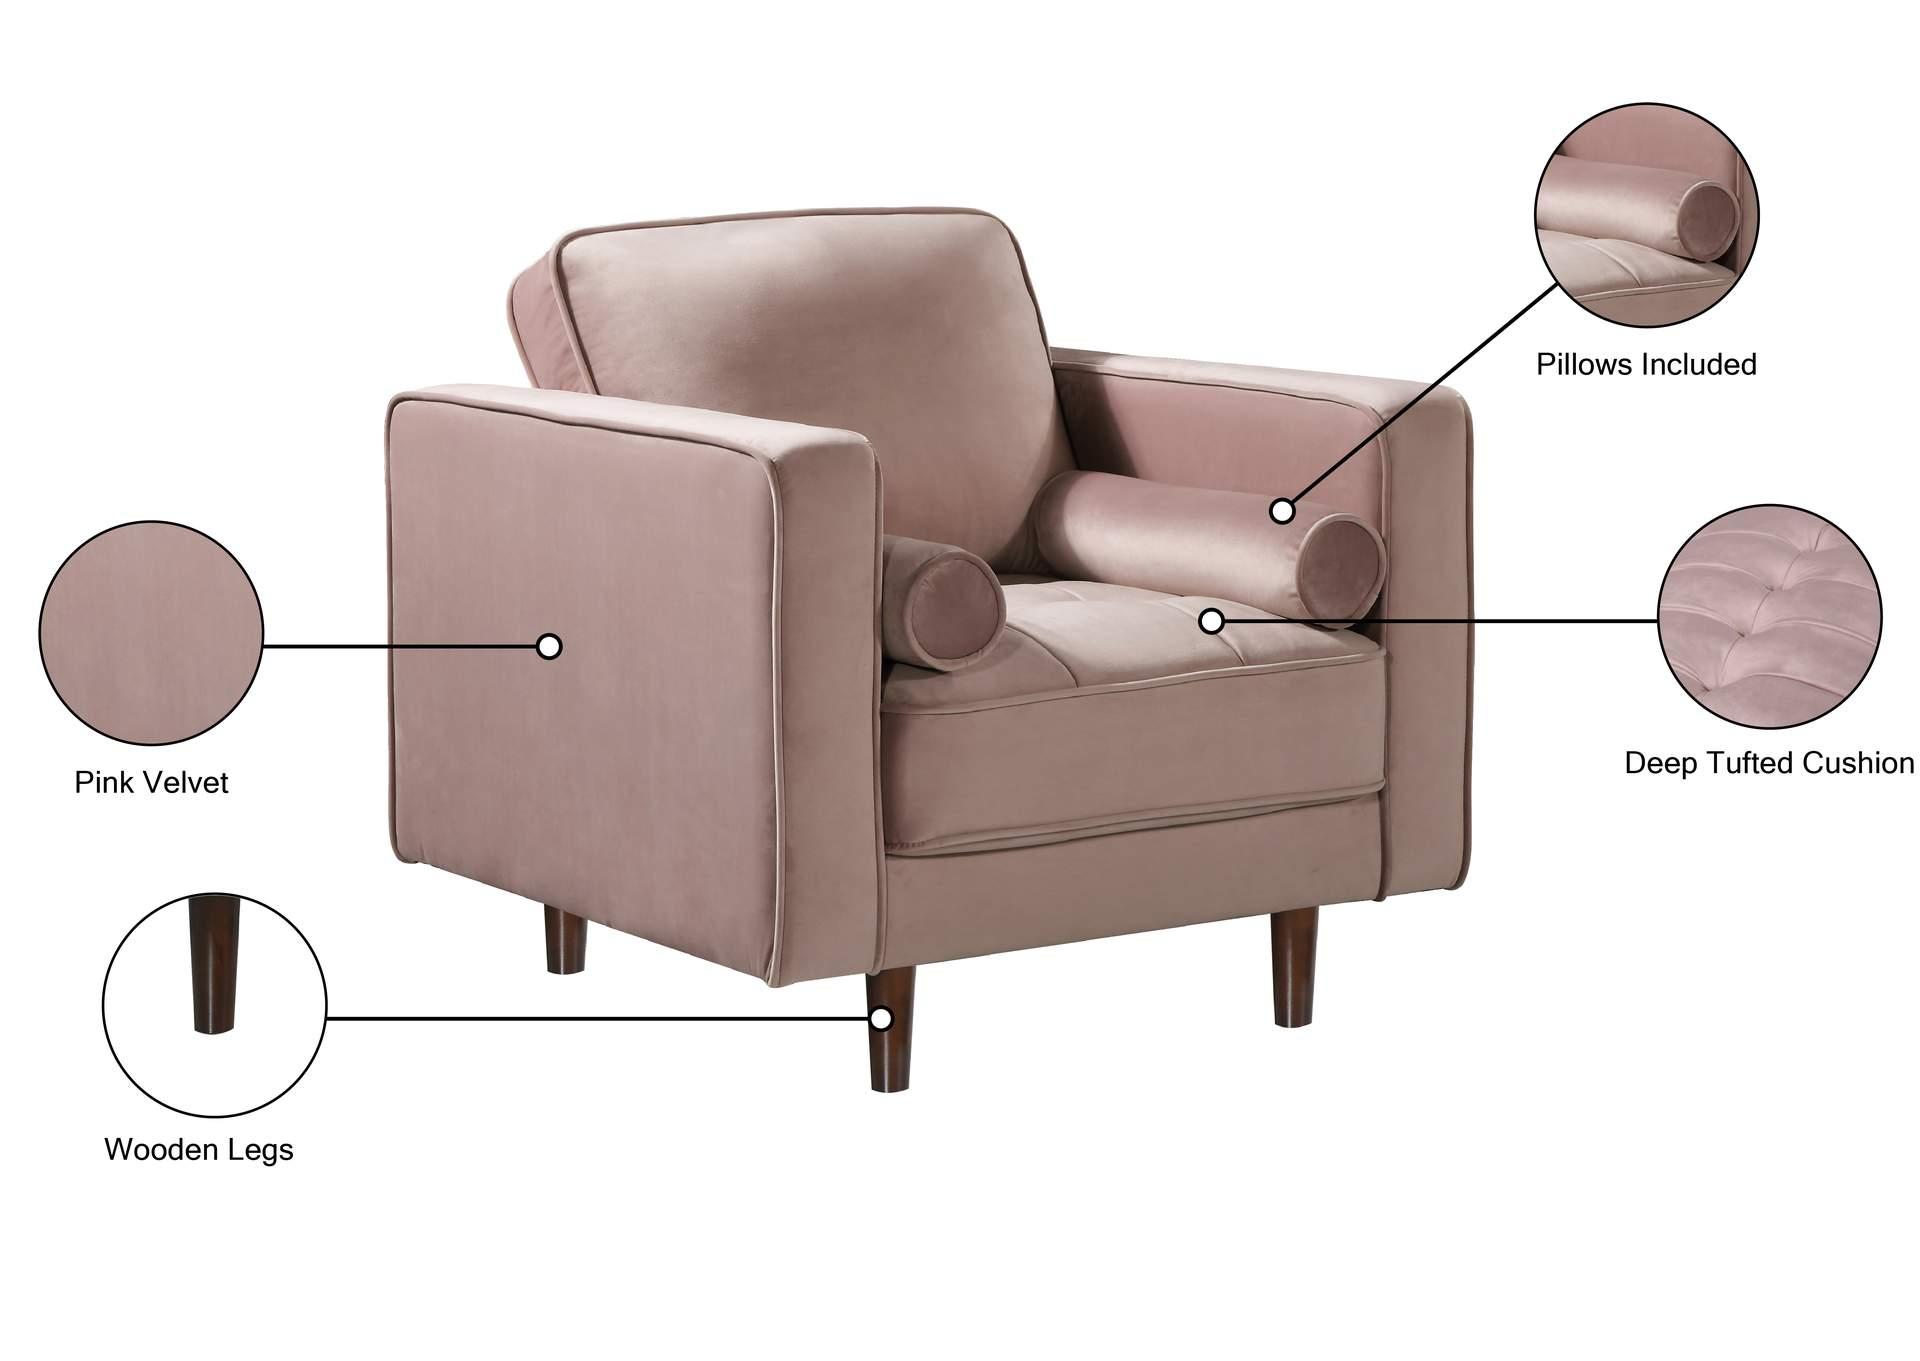 Emily Pink Velvet Chair Best Buy Furniture And Mattress